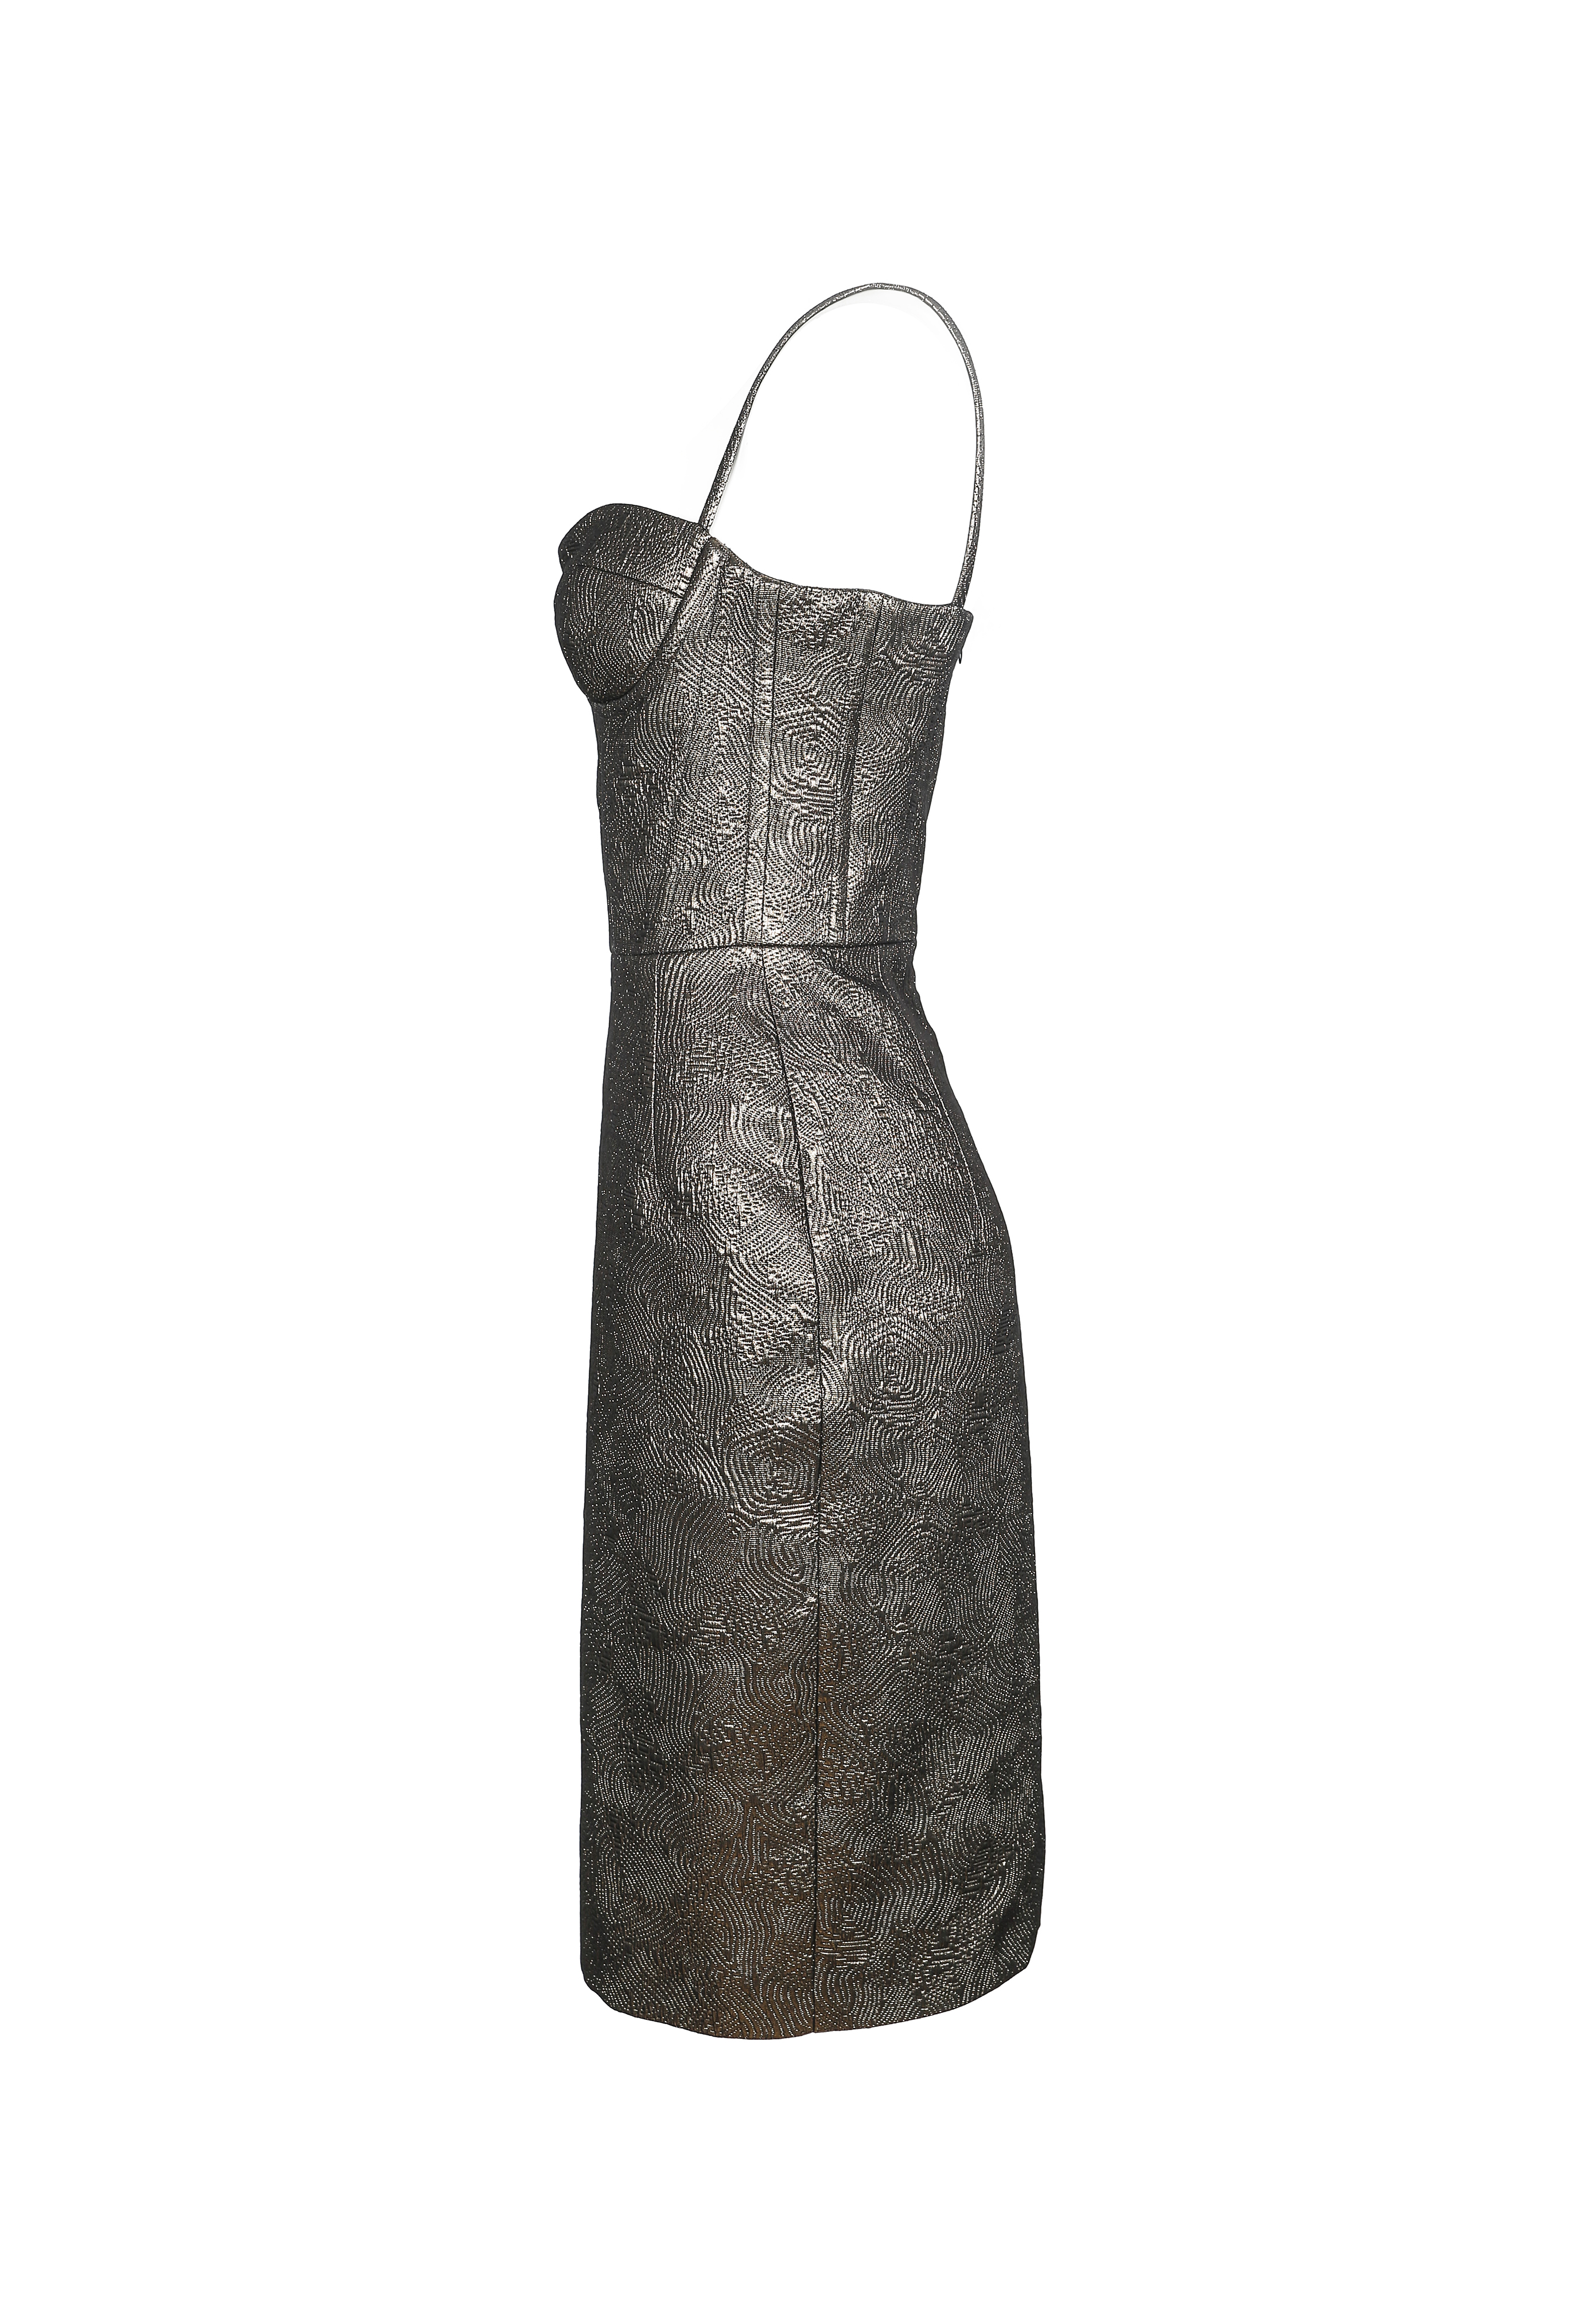 Jacquard Corset Dress